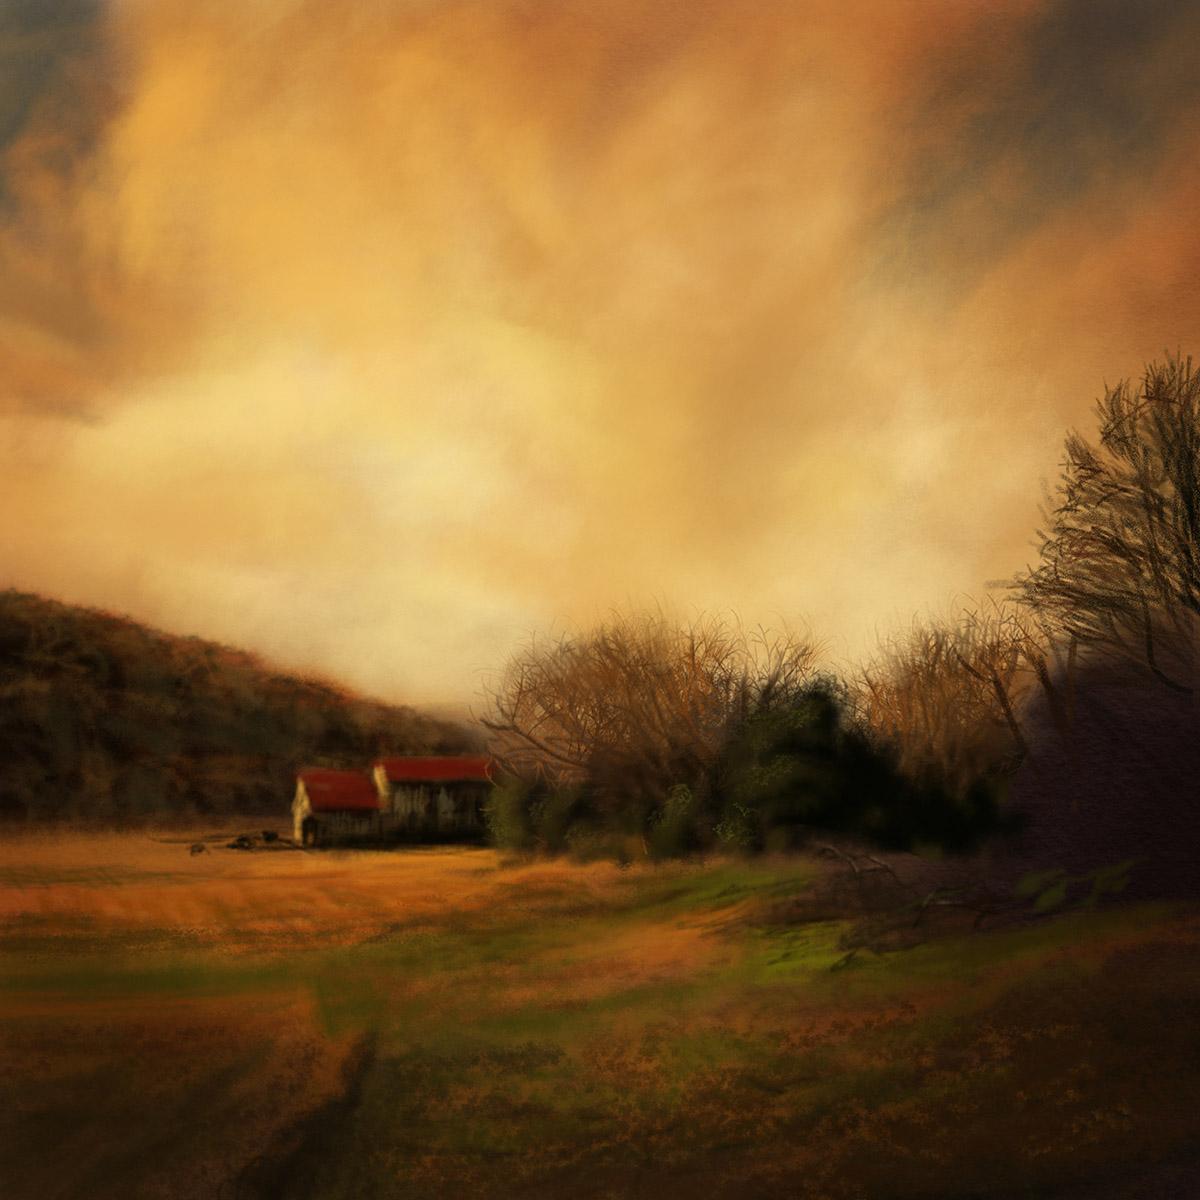 Big Cove Barn - Alabama - Todd Lee